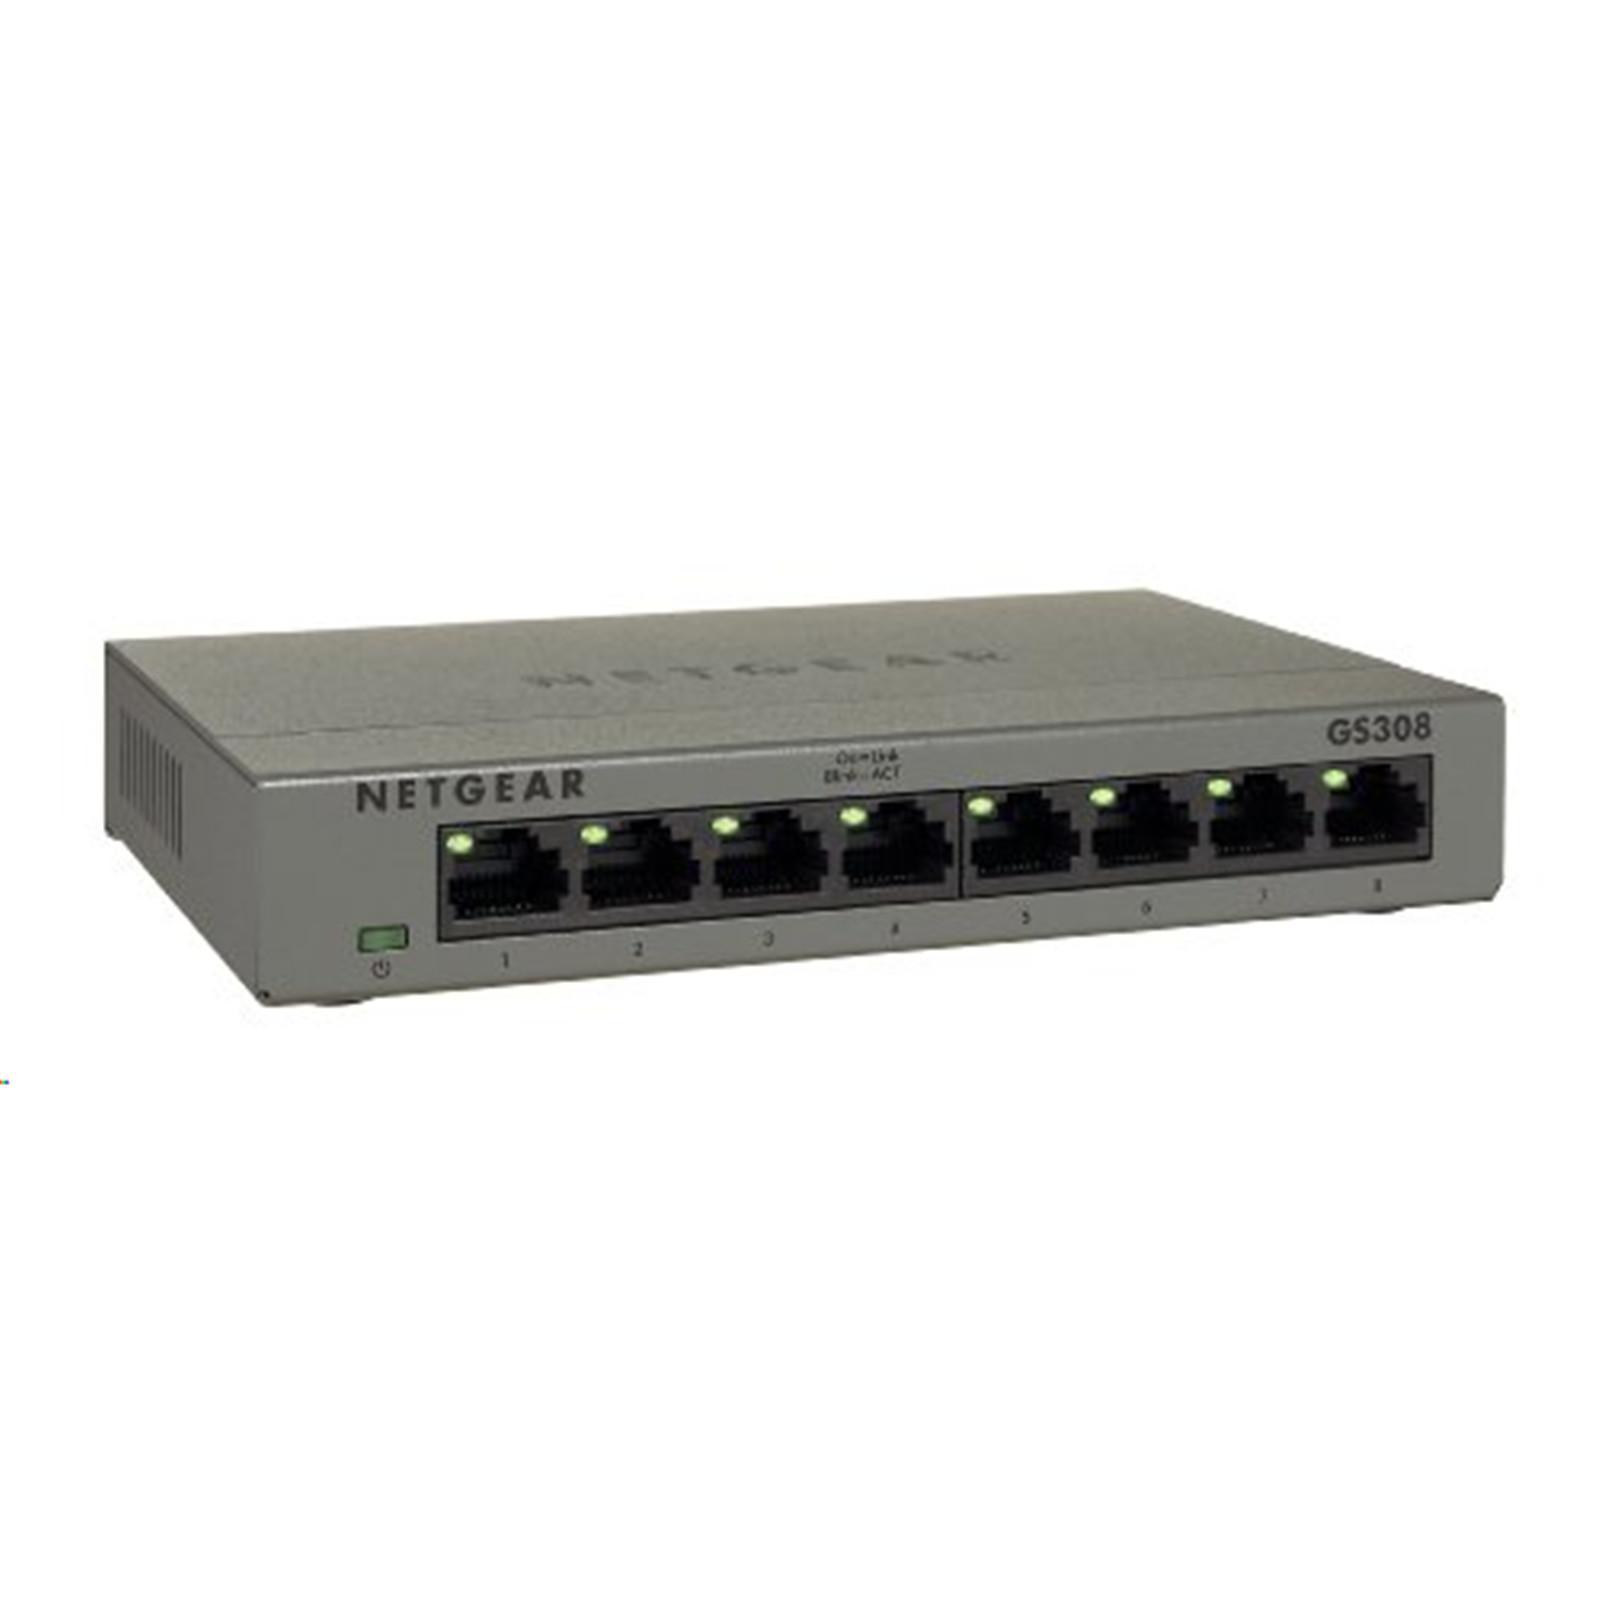 NETGEAR 8-Port Gigabit Ethernet Switch GS308